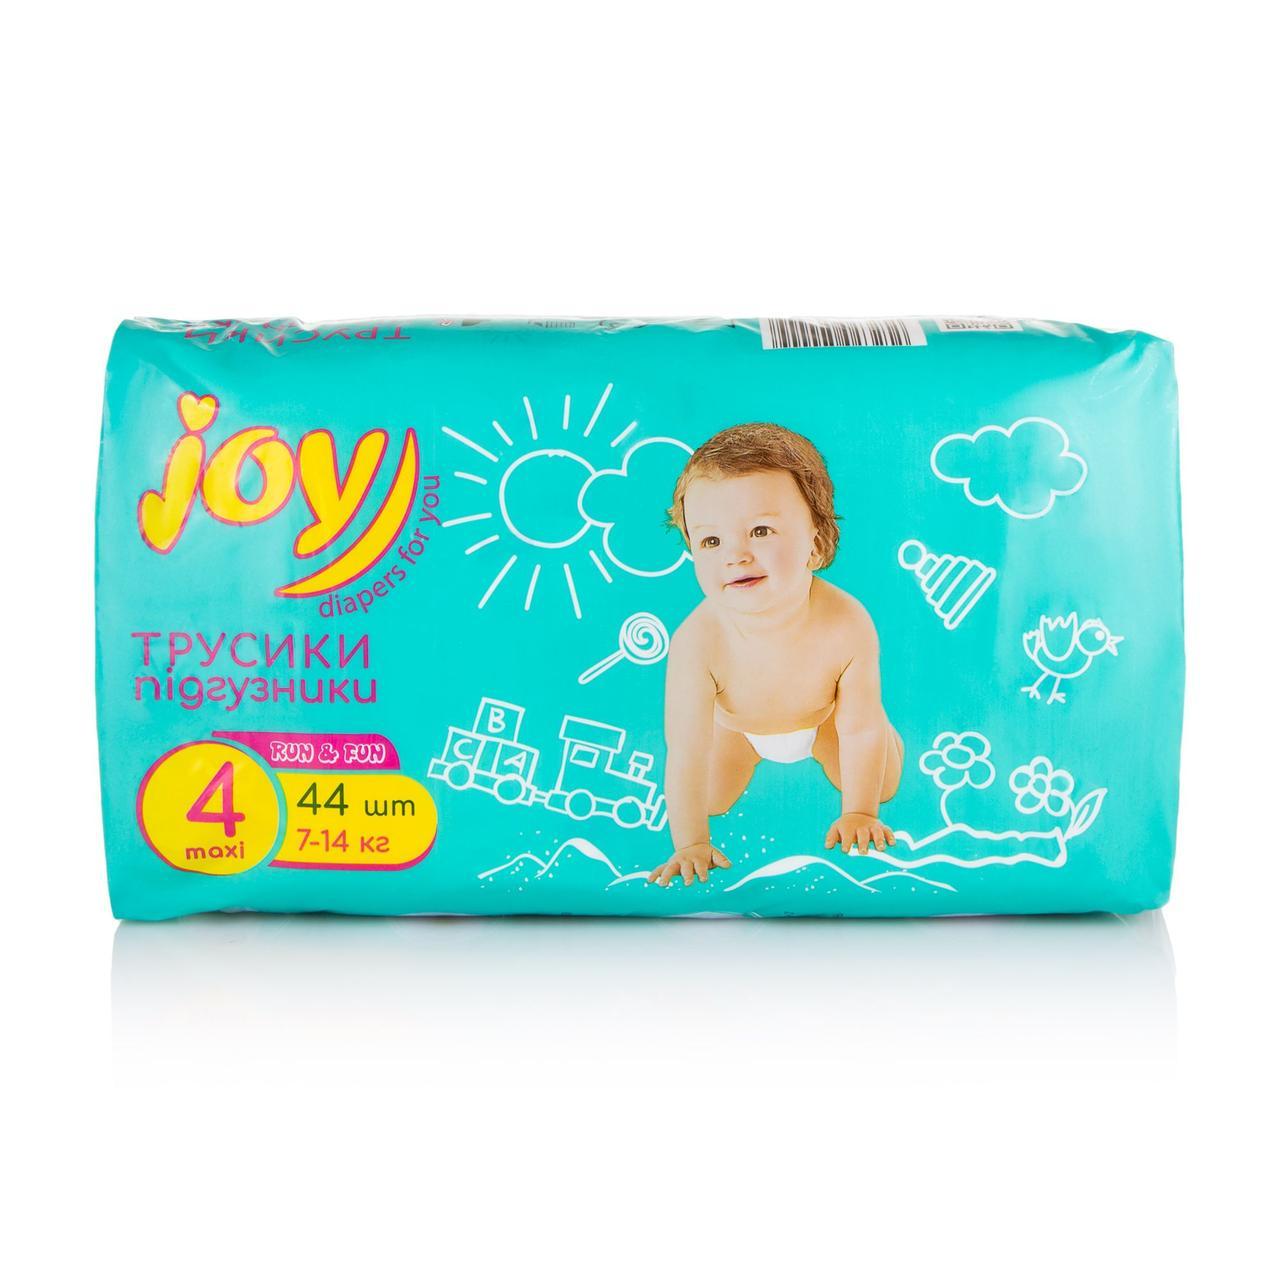 Подгузники-трусики Joy Run and Fun размер 4, 7-14 кг, 44 шт